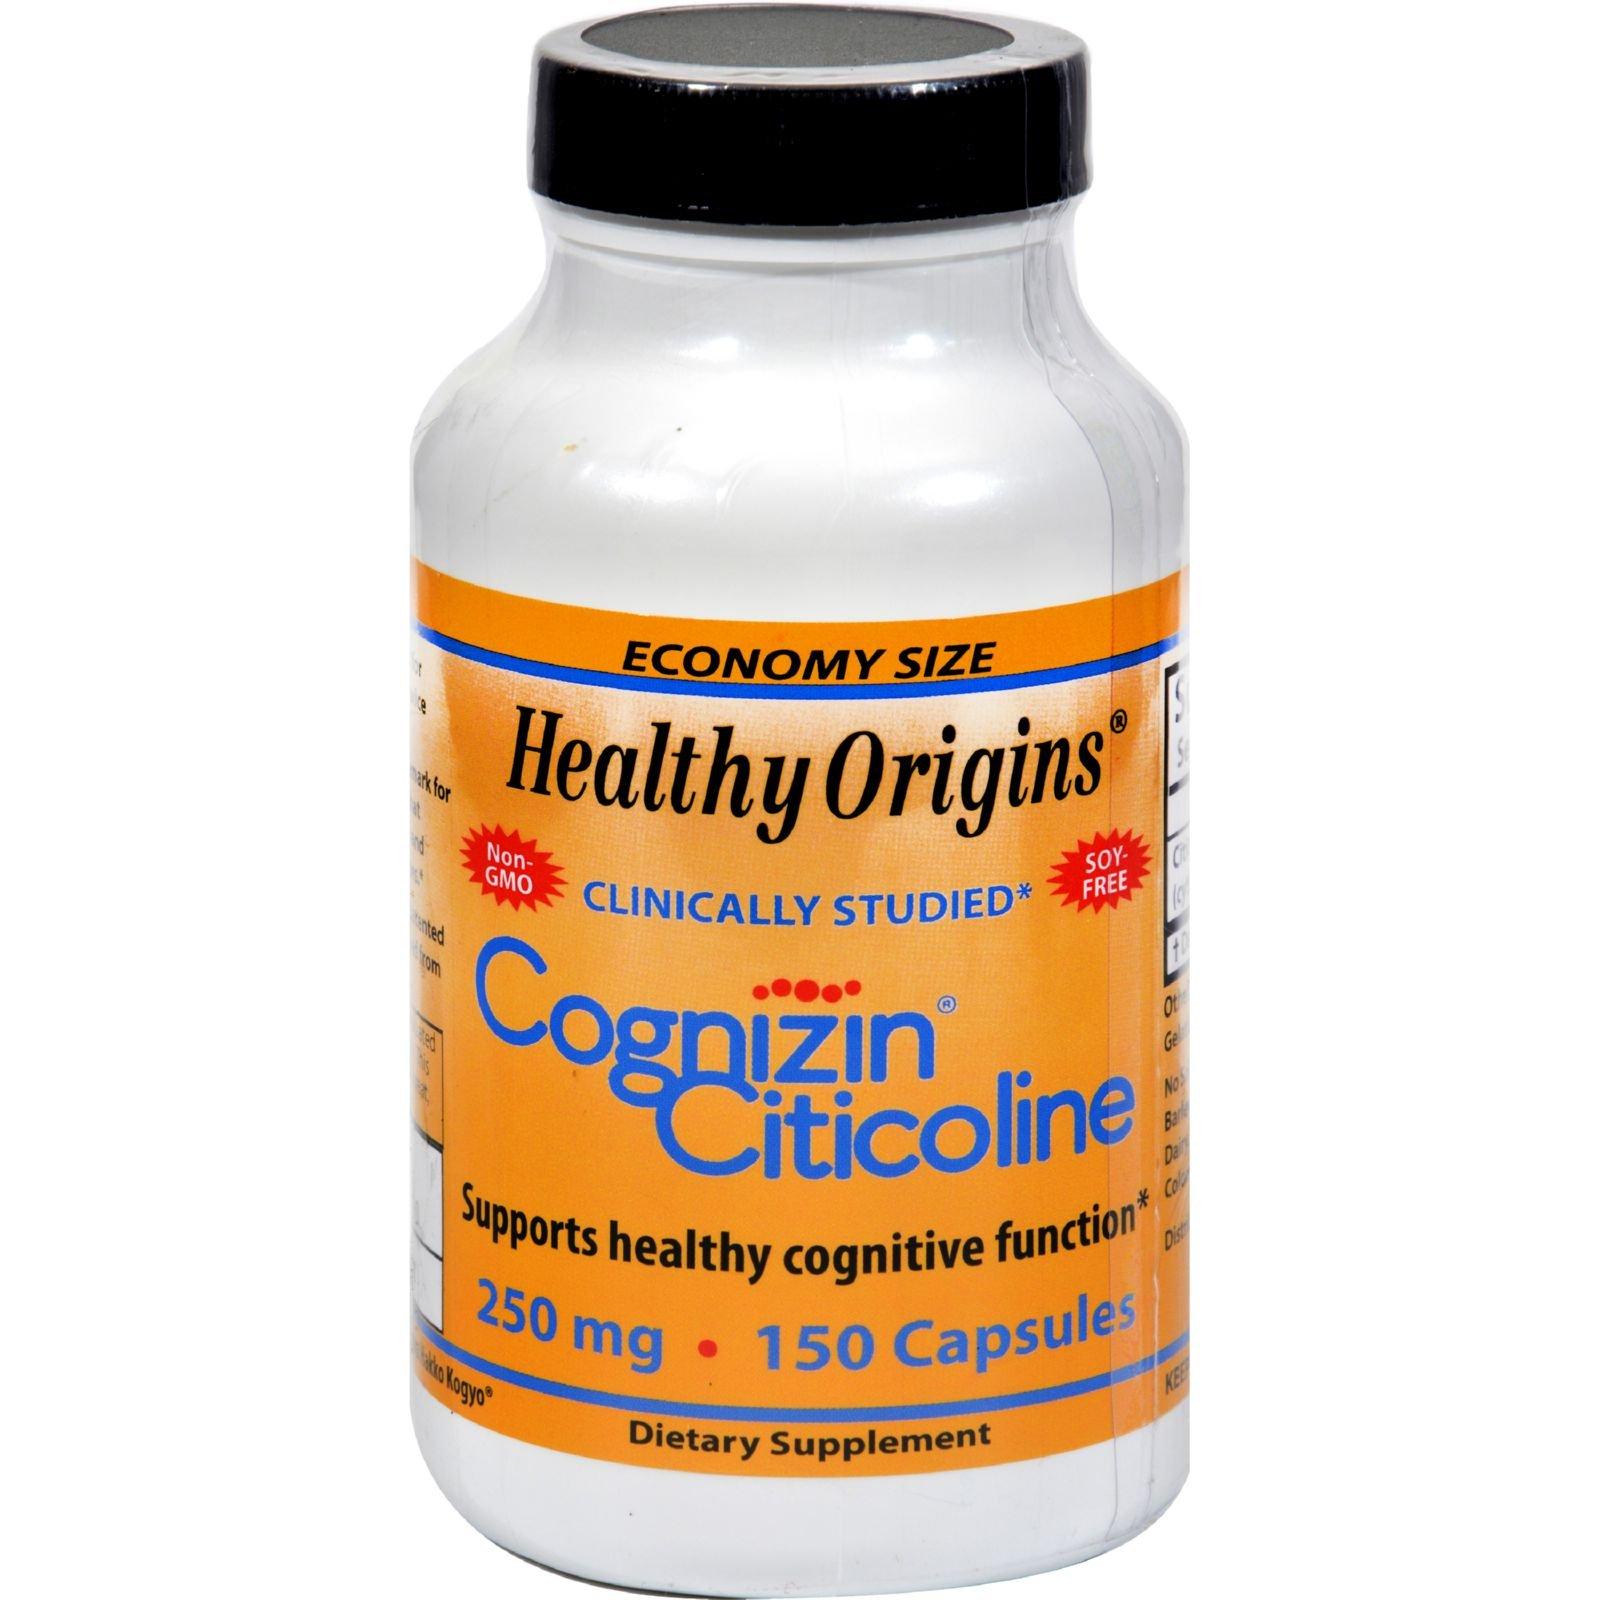 HEALTHY ORIGINS COGNIZIN(CITICOLINE)250MG, 150 CAP